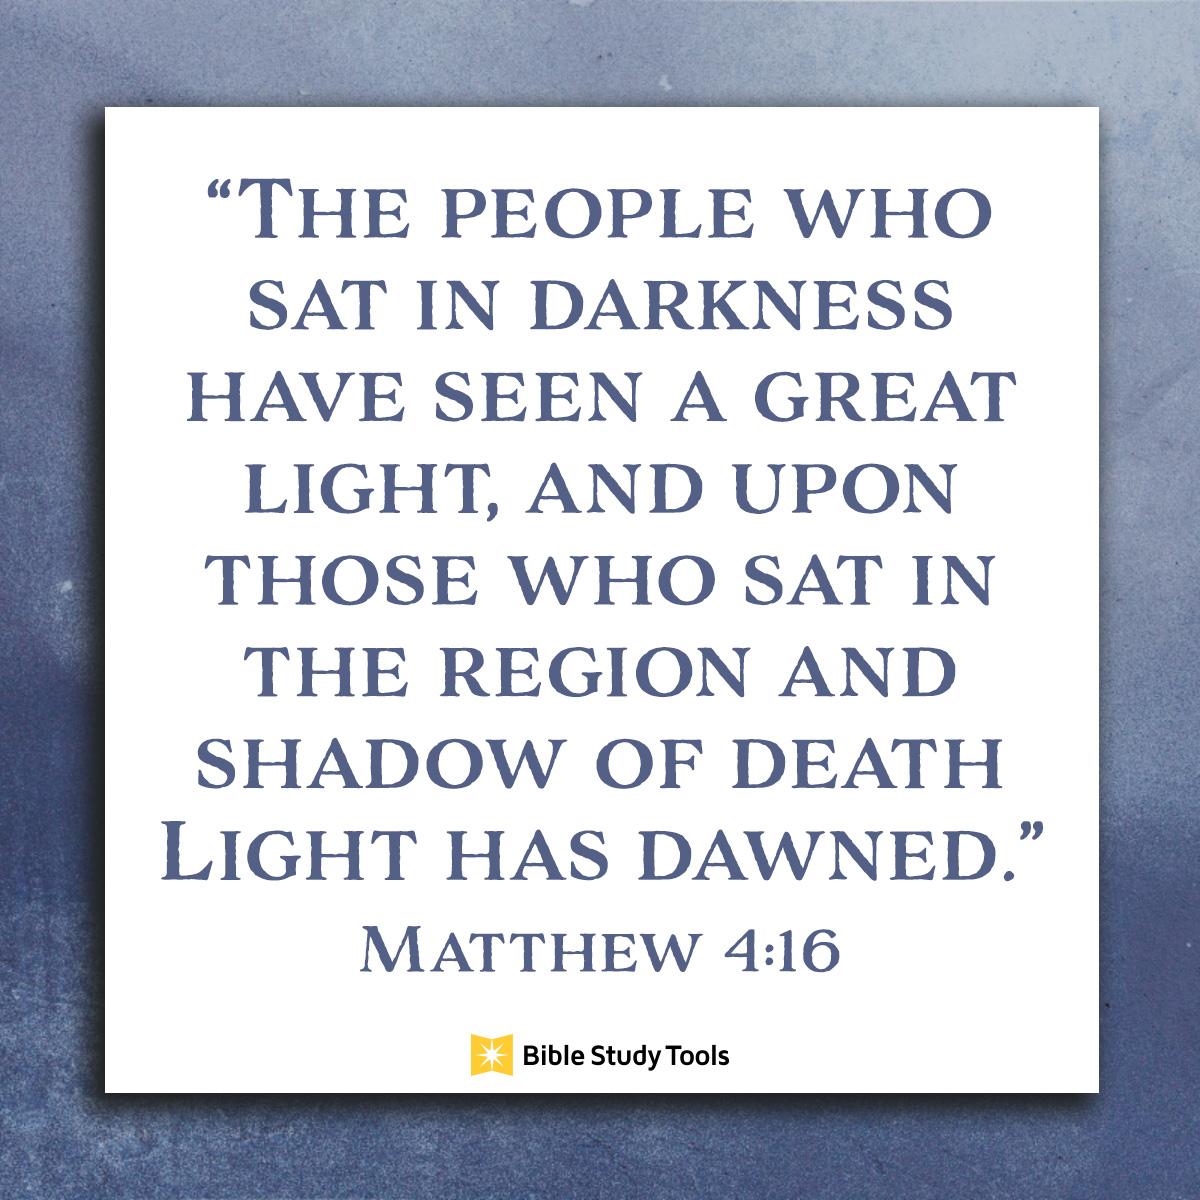 Matthew 4:16